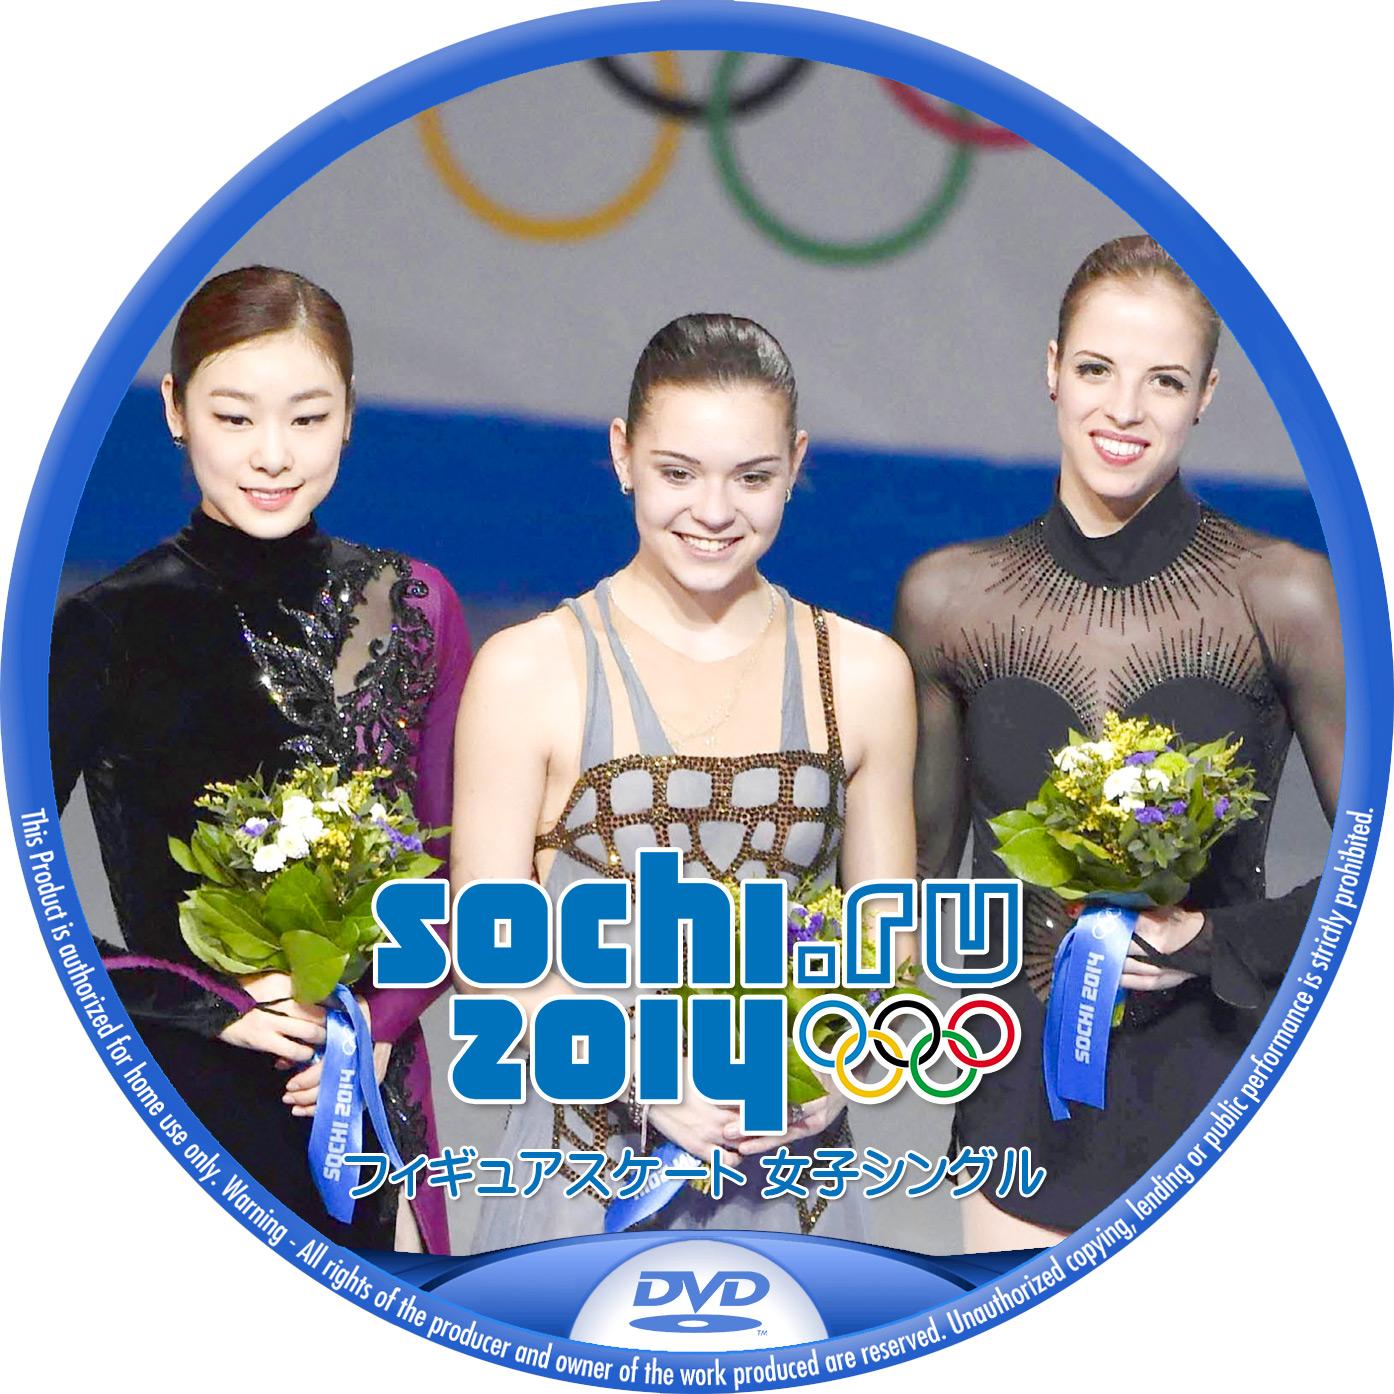 Sochi_Figure_Woens-DVD6